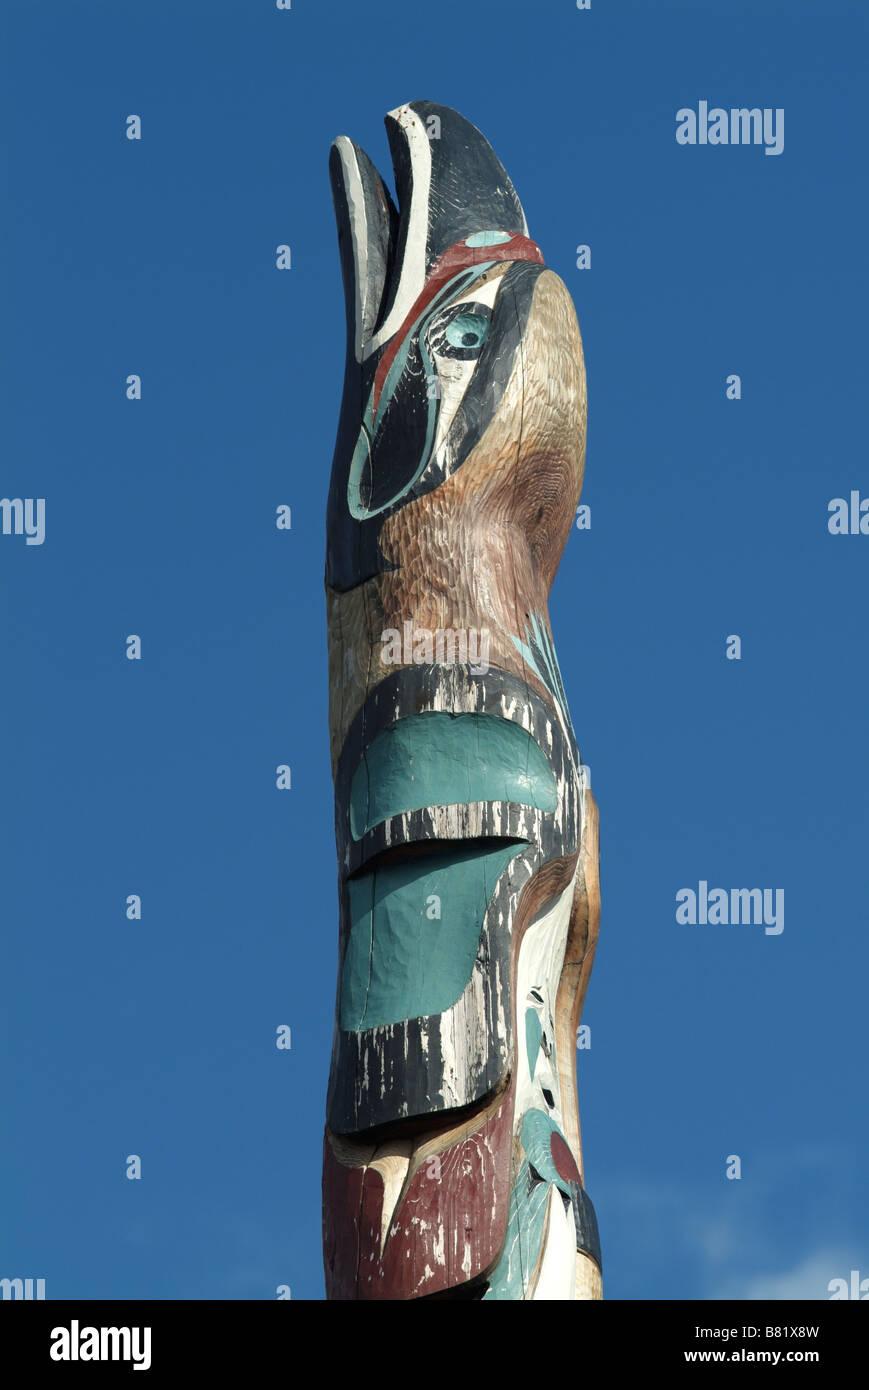 The Totem Pole In The Car Park Of The Prestoungrange Gothenburg